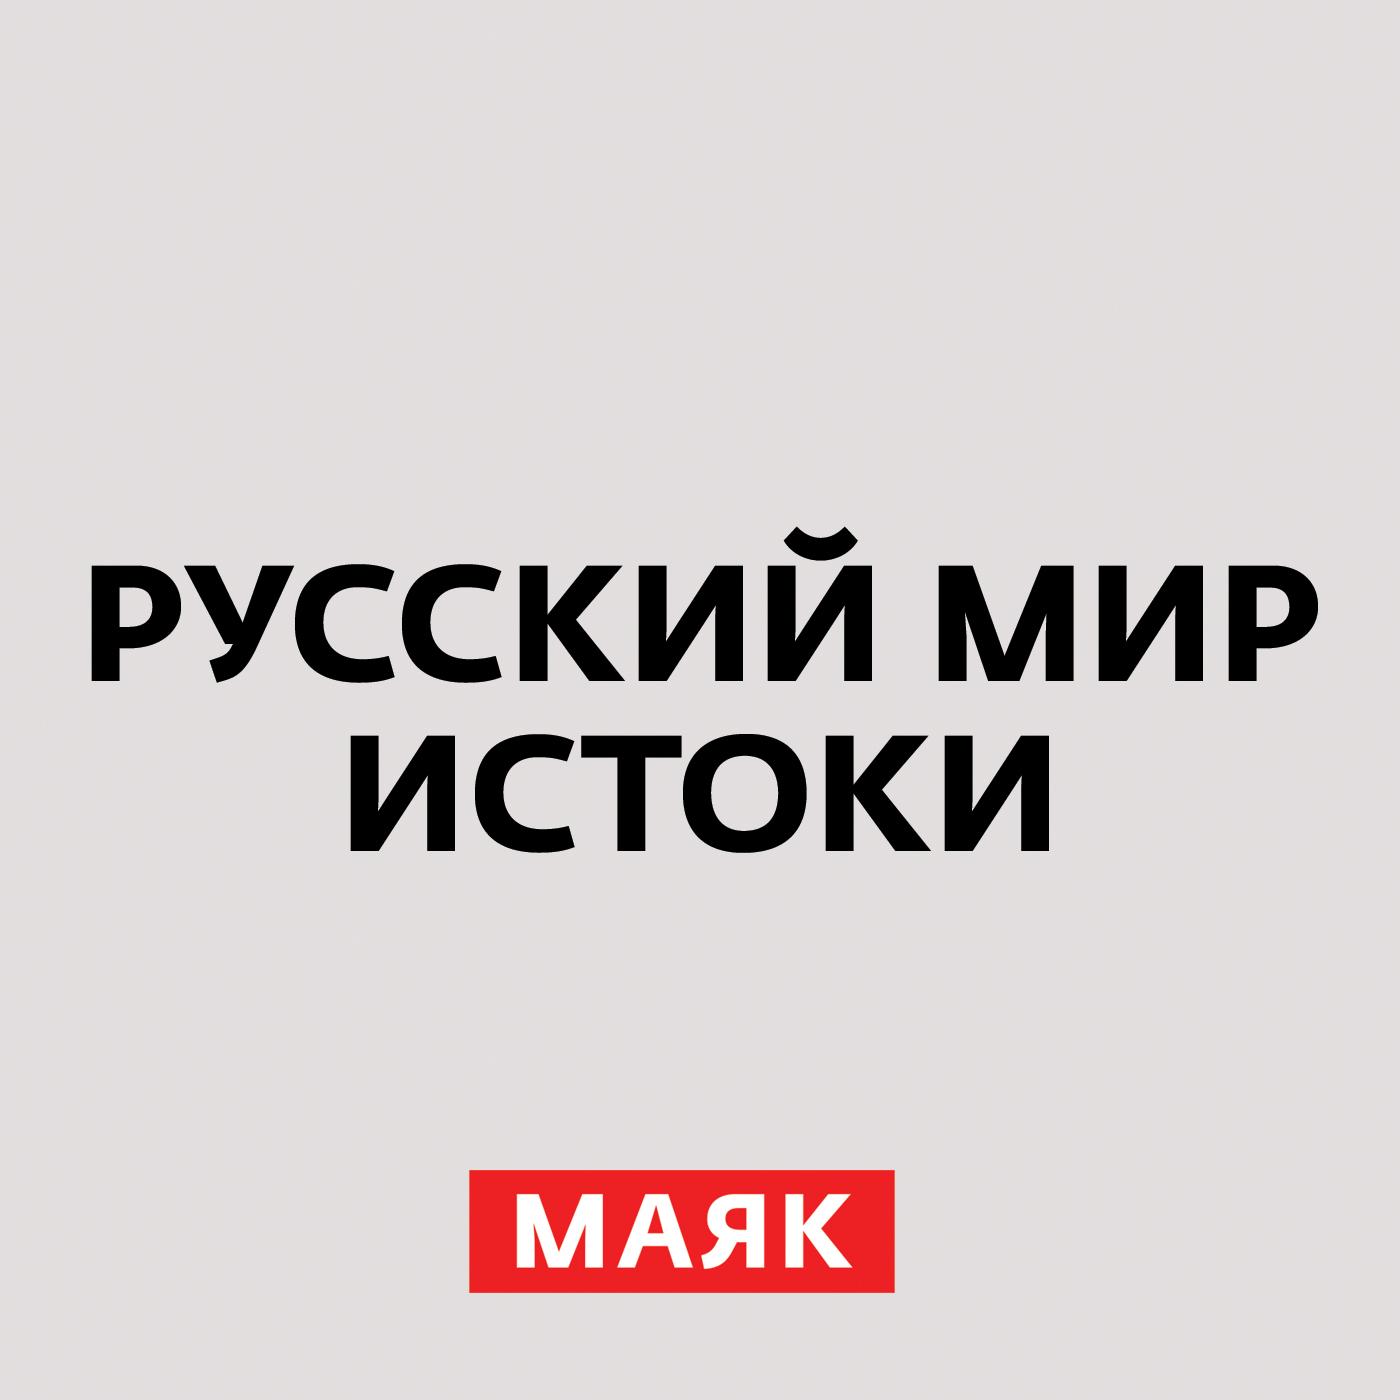 Творческий коллектив радио «Маяк» Вещий Олег князь олег